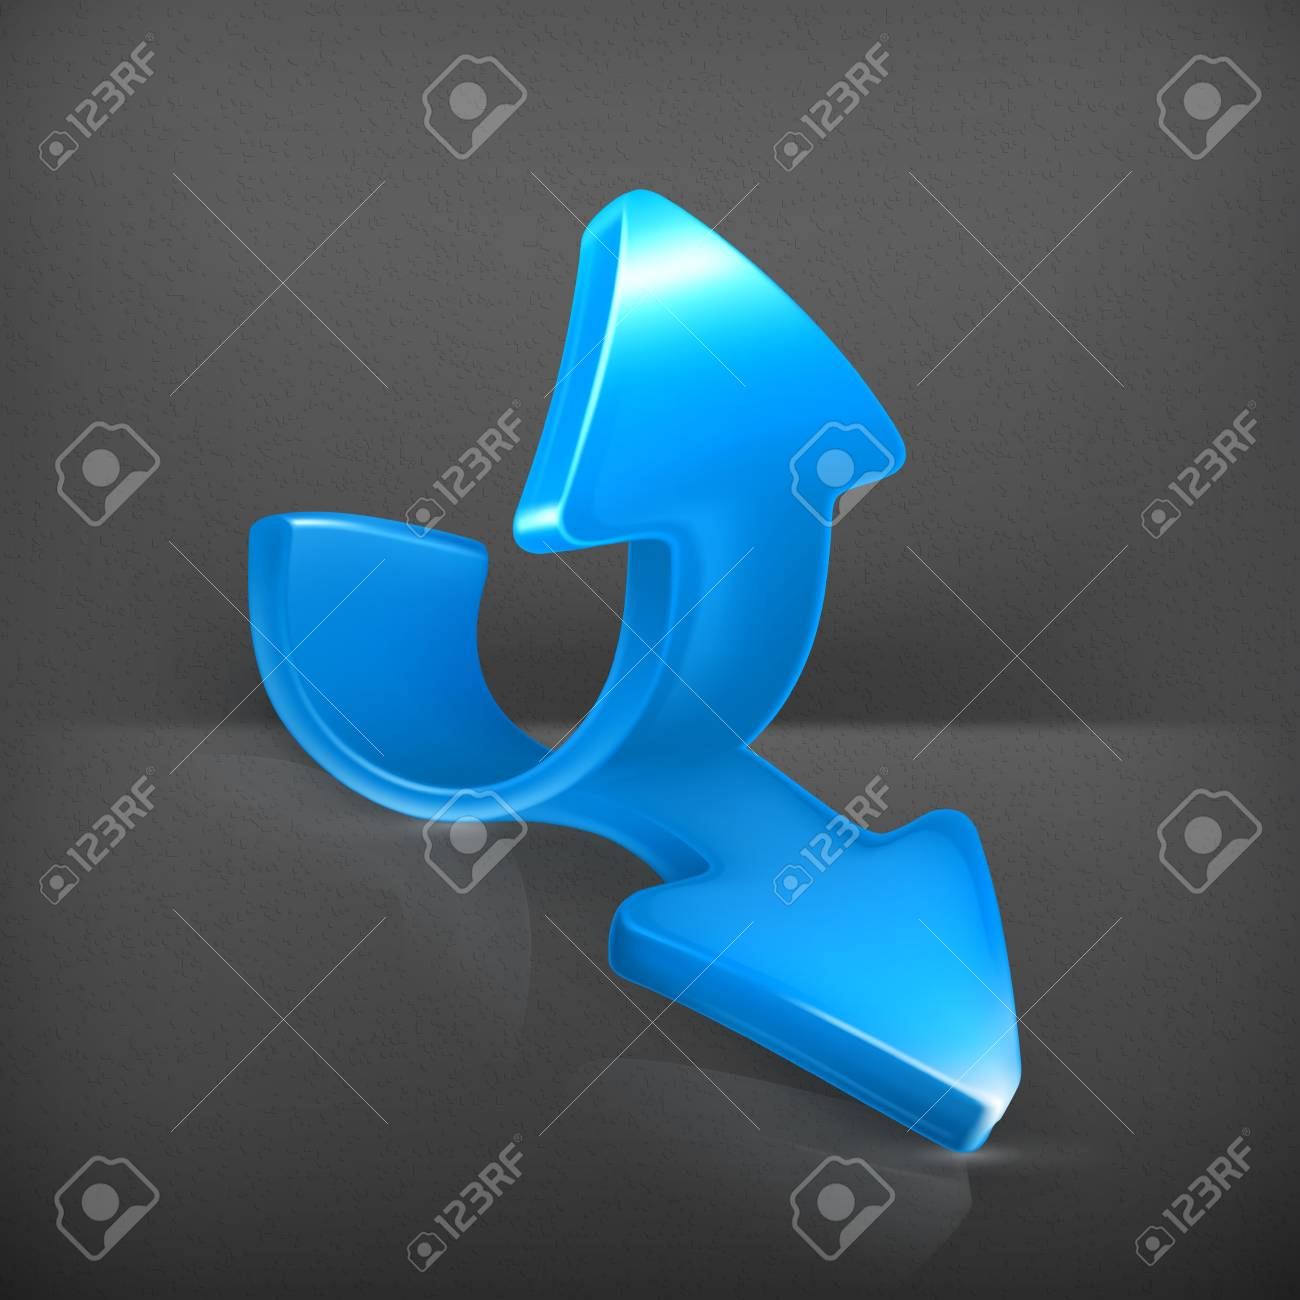 Emblem of blue arrows Stock Vector - 19713213